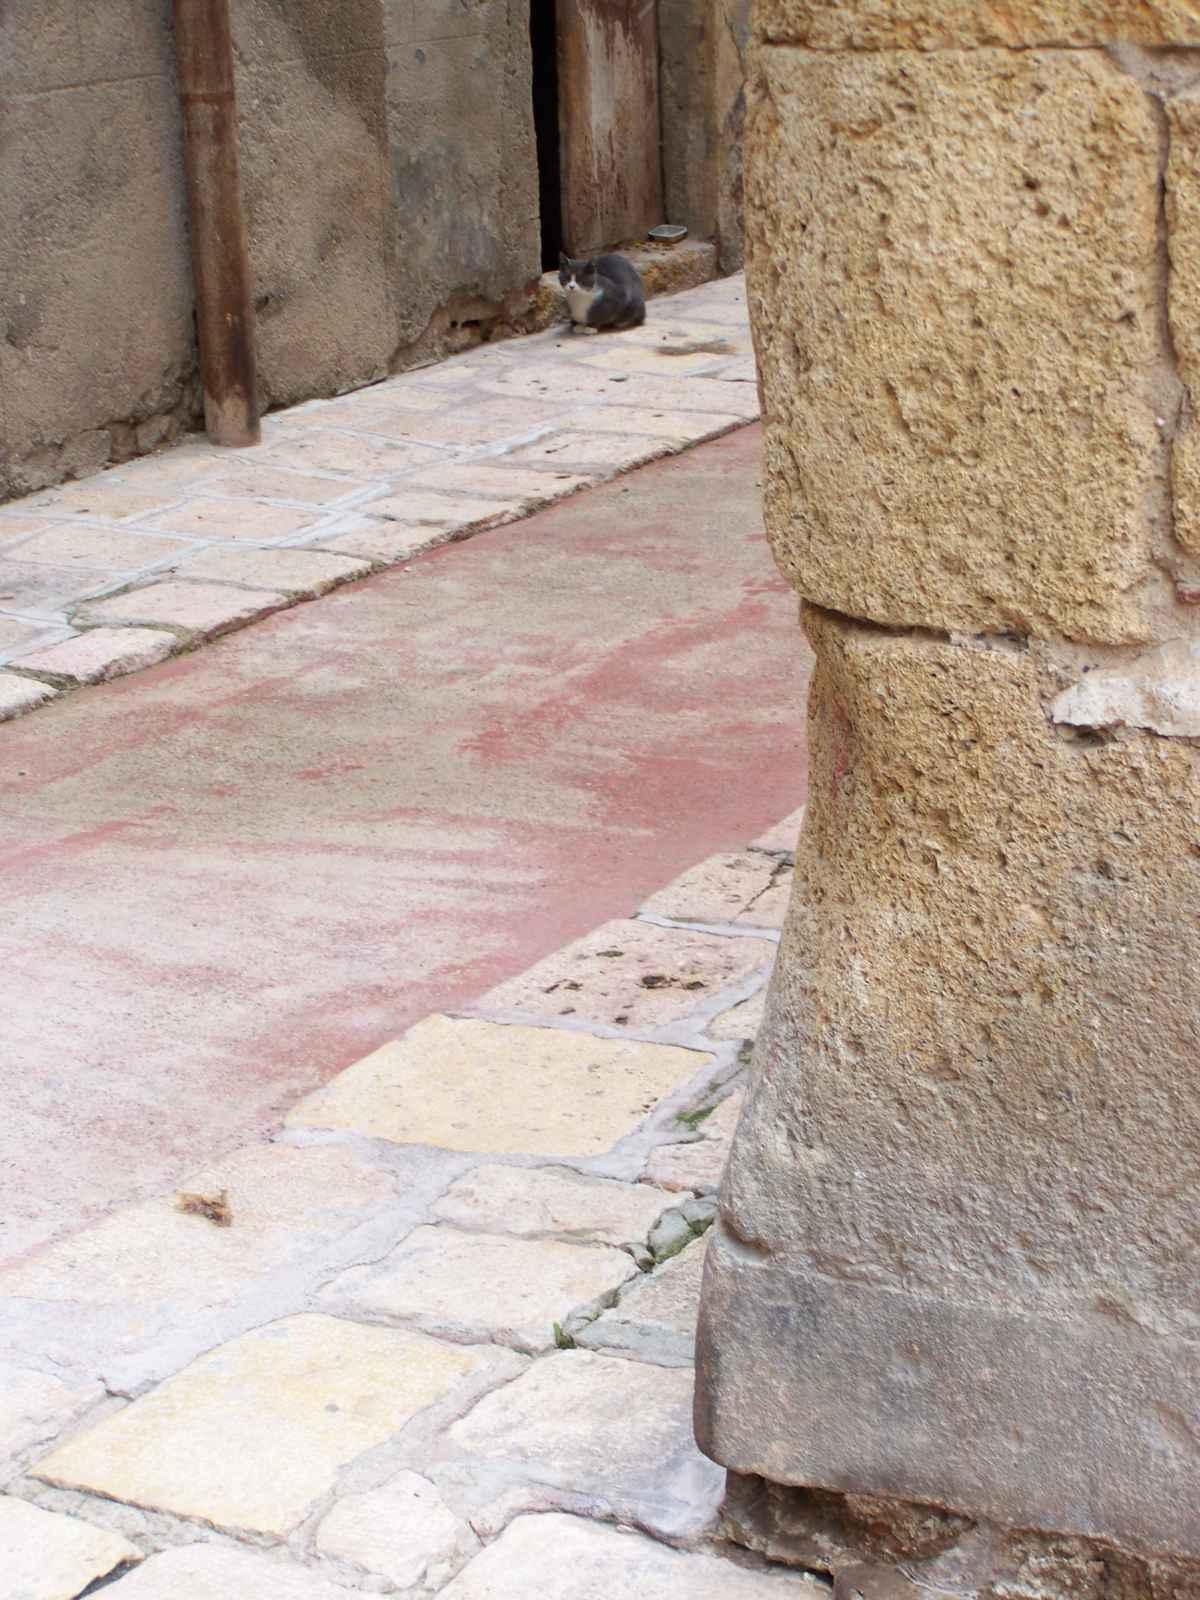 barcelona_2010_1600px_053